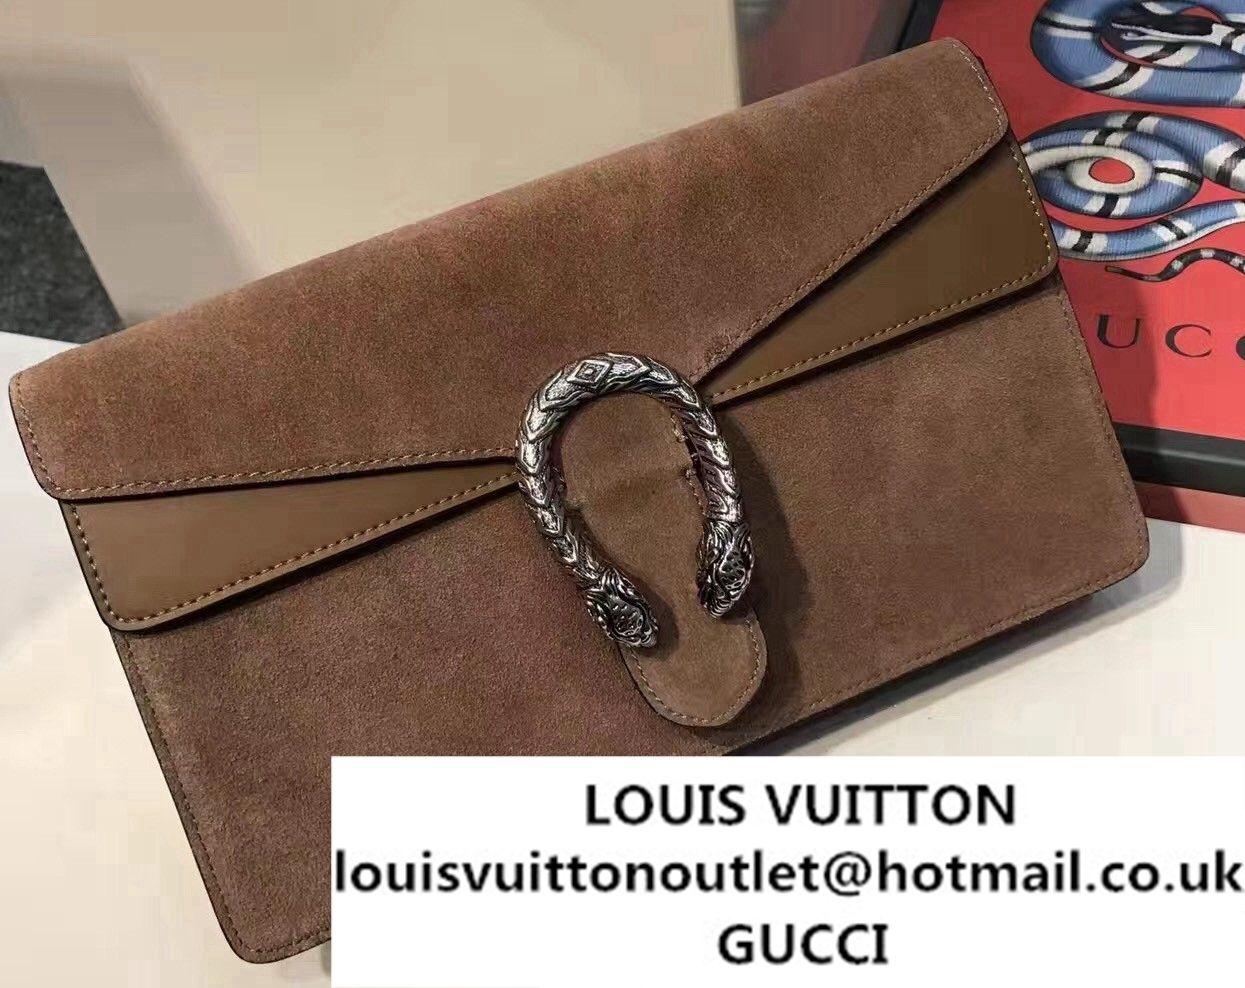 45ed7ce911e Gucci Dionysus Suede Clutch Pouch Bag Camel 2017